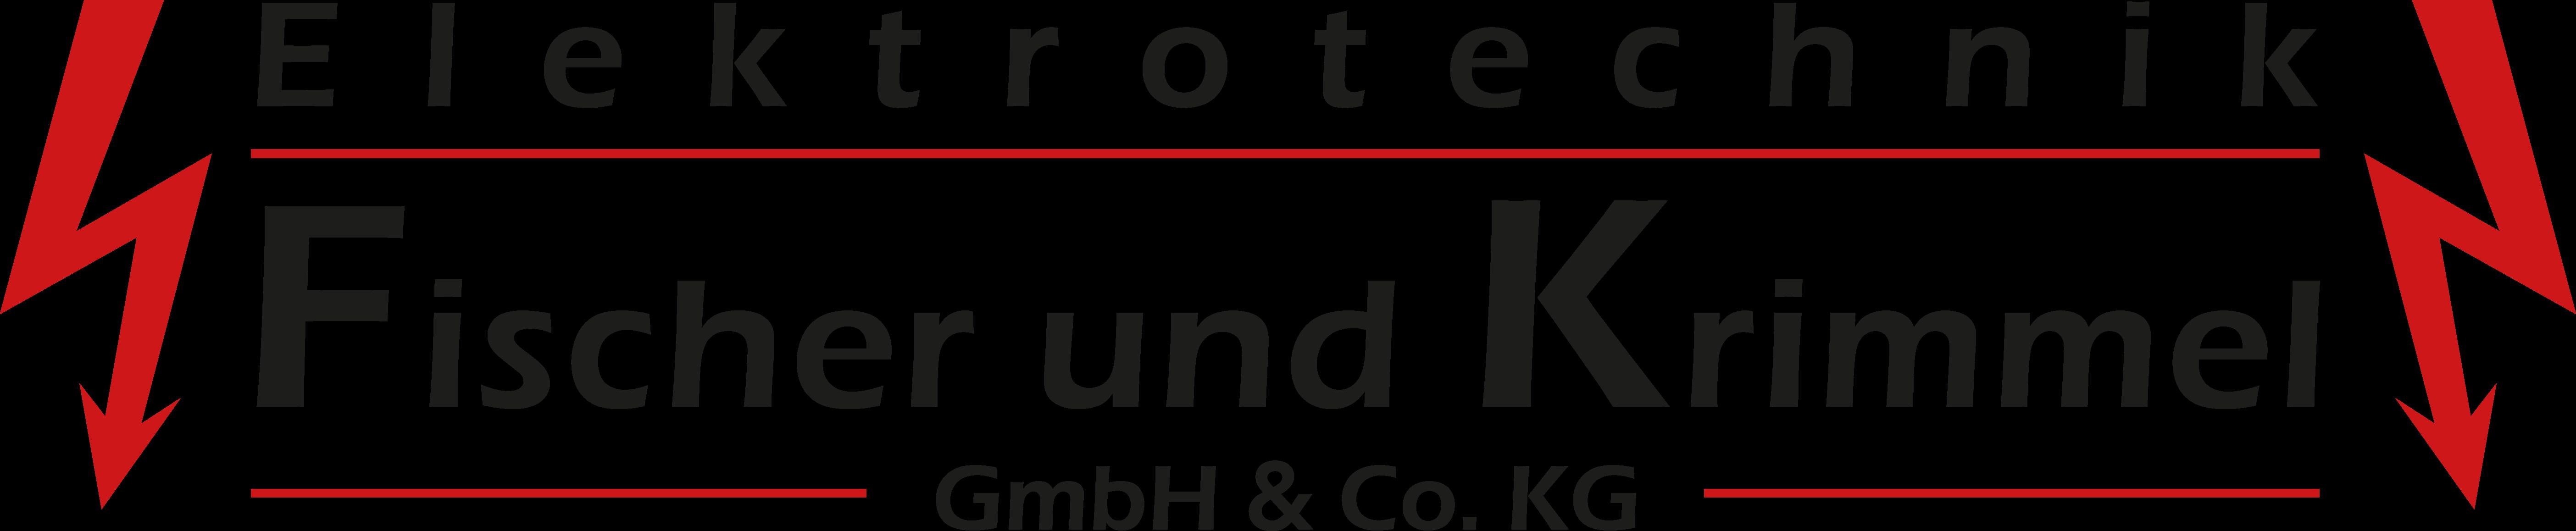 Elektrotechnik Fischer Krimmel